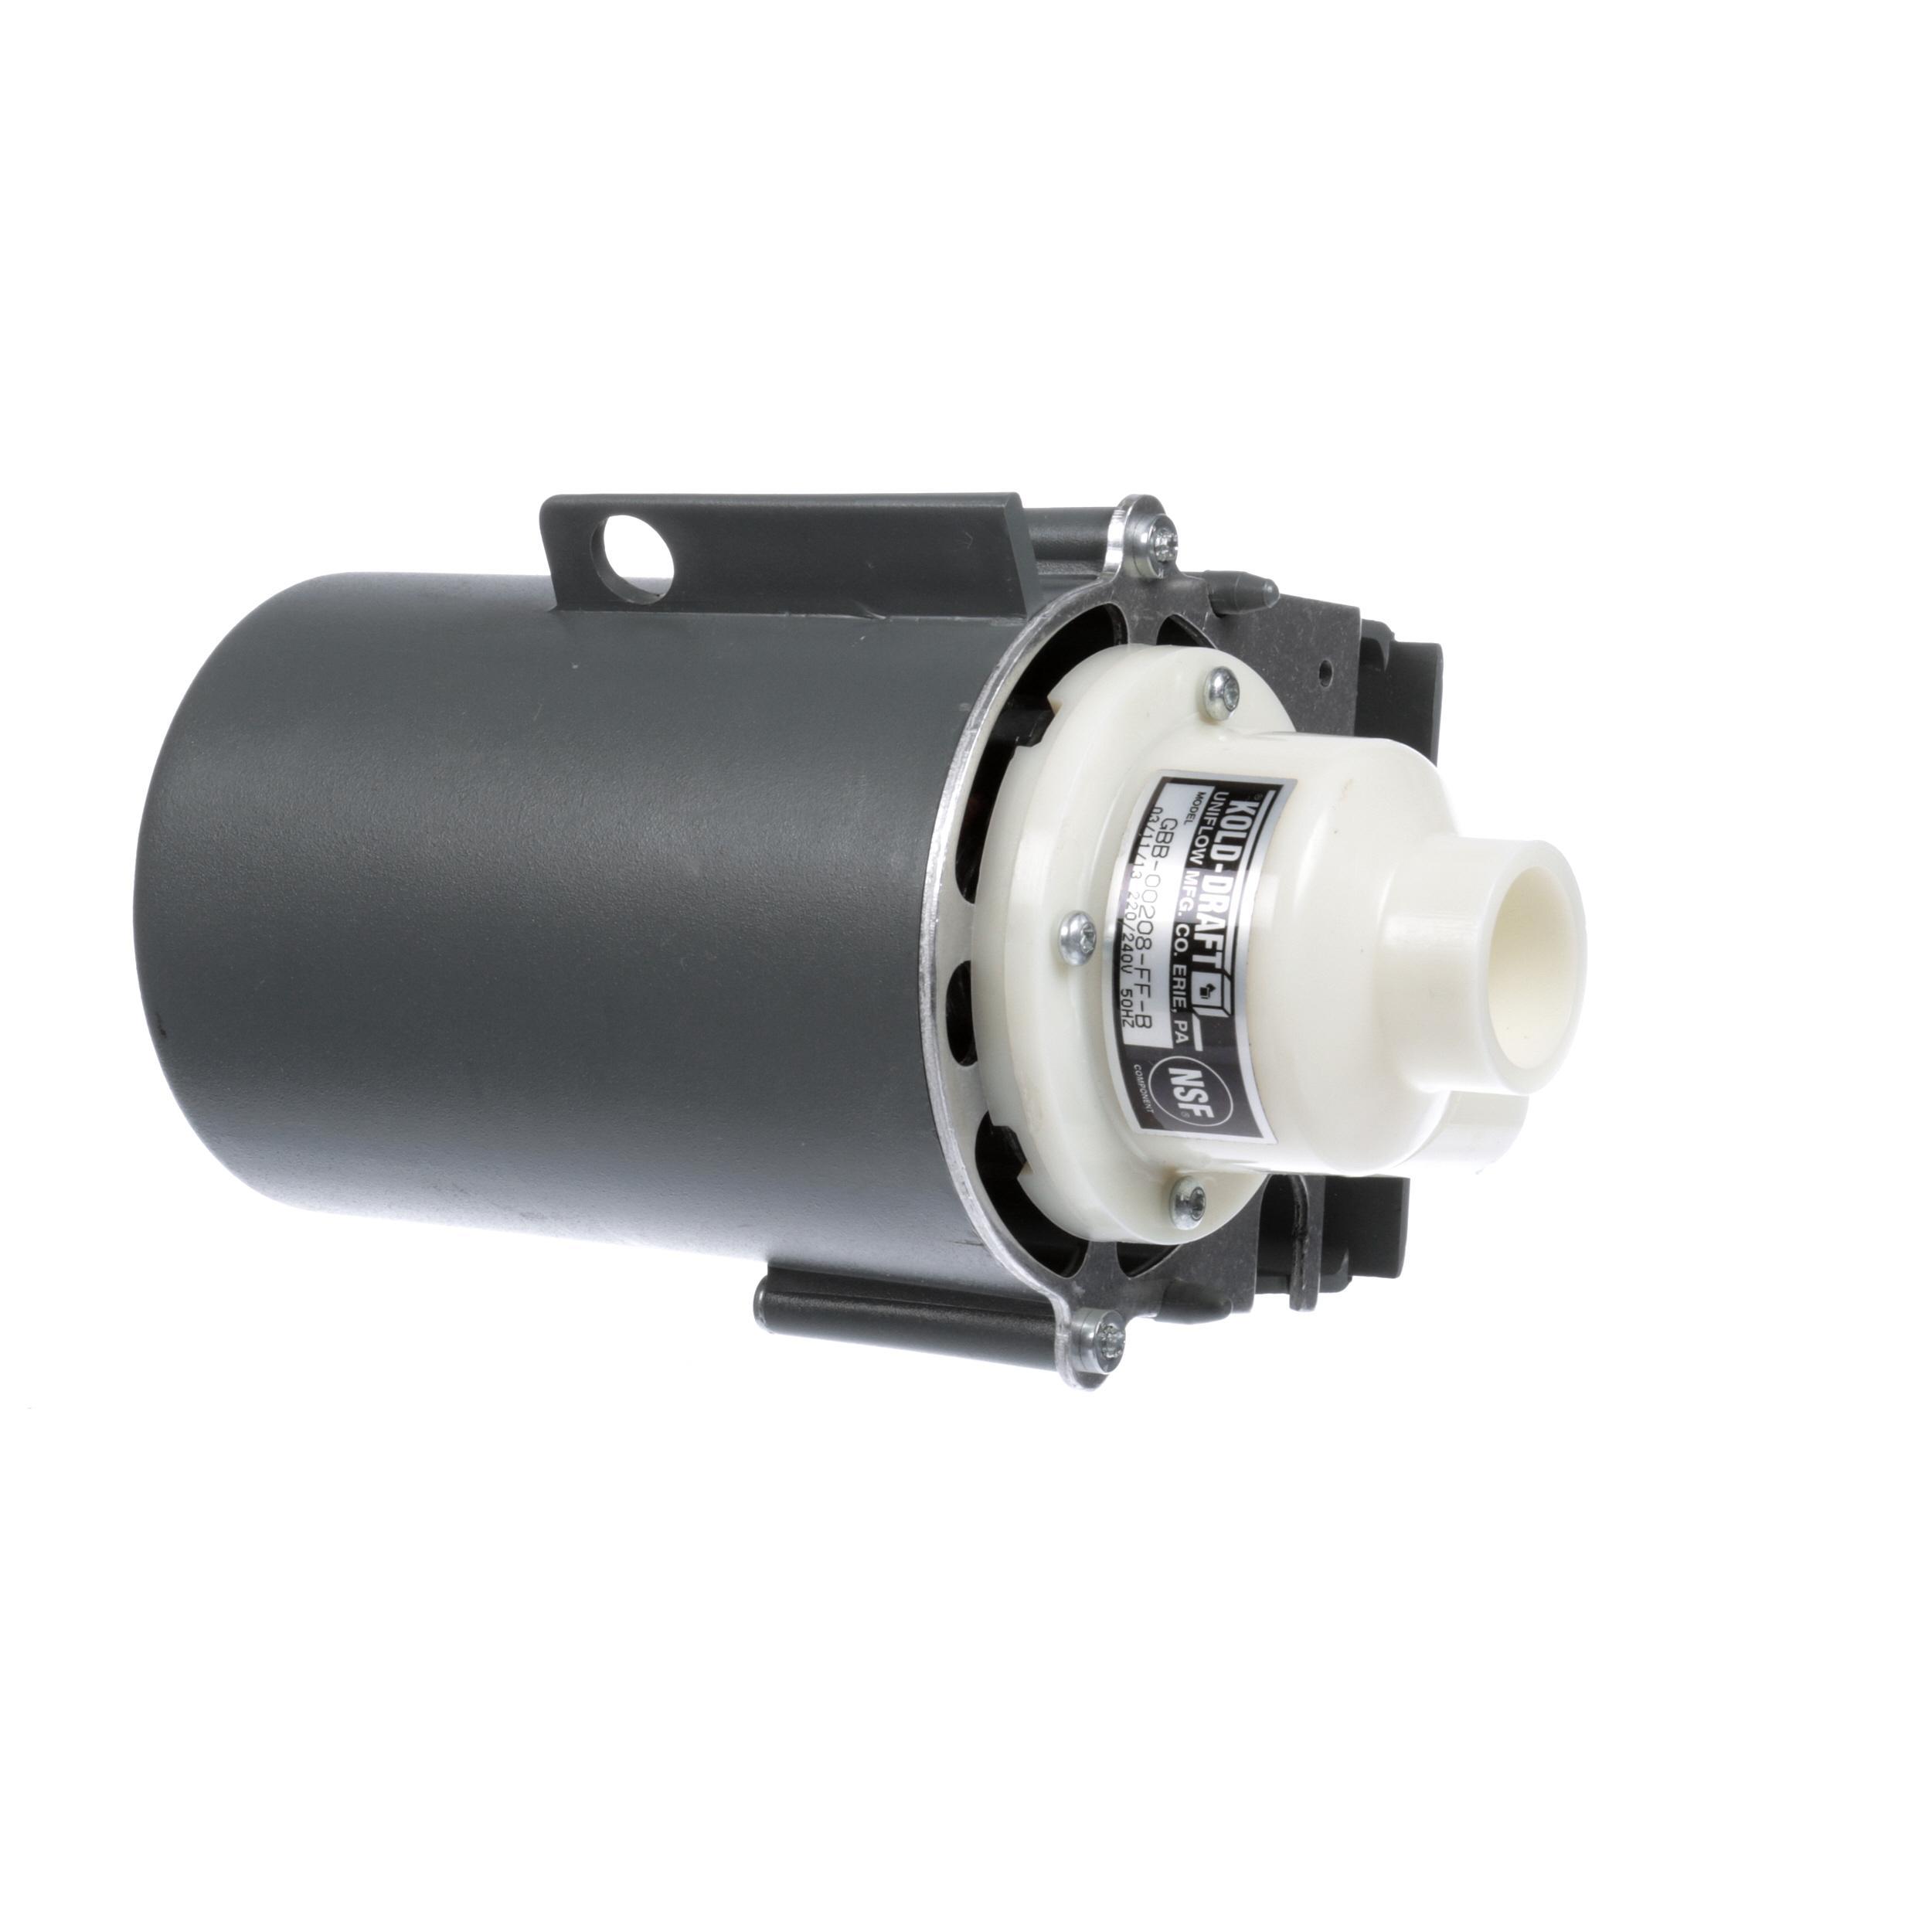 Kold draft water pump fan motor part gbr00208ffb for Water pump motor parts